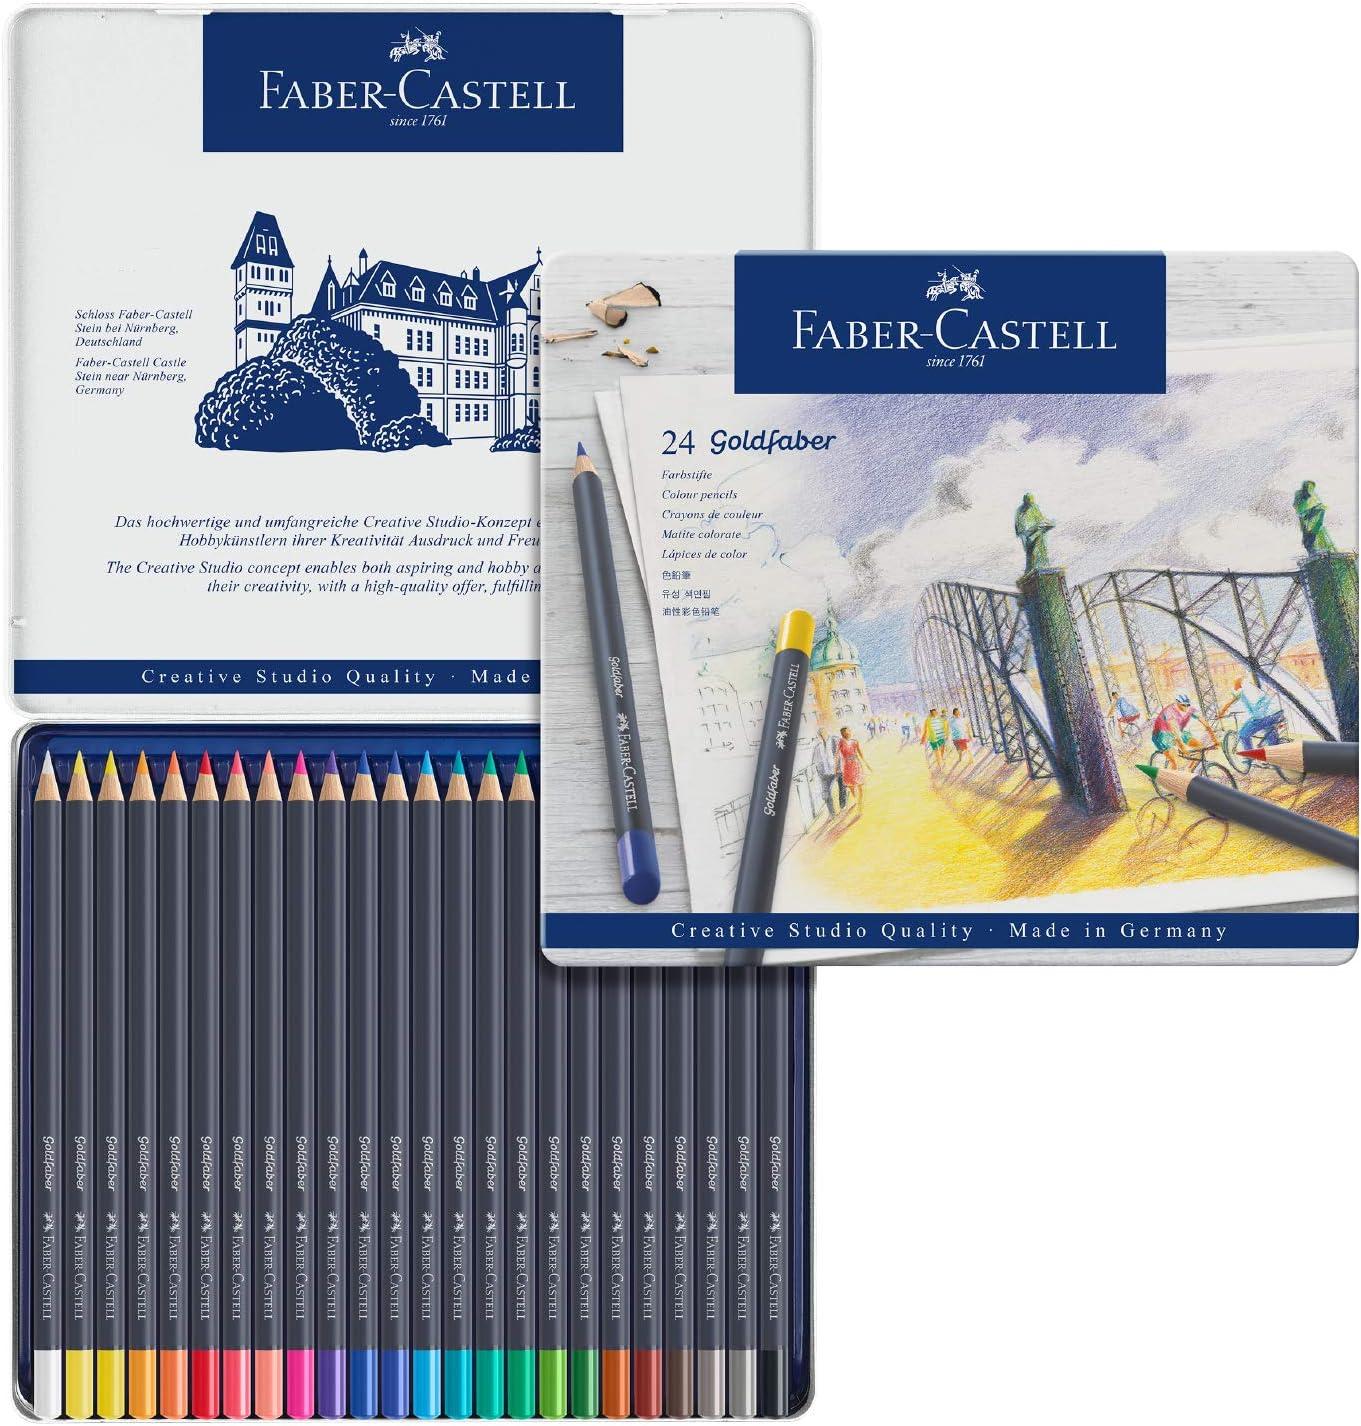 Gold Faber-Castell 140928 F/üller Grip Edition Feder B